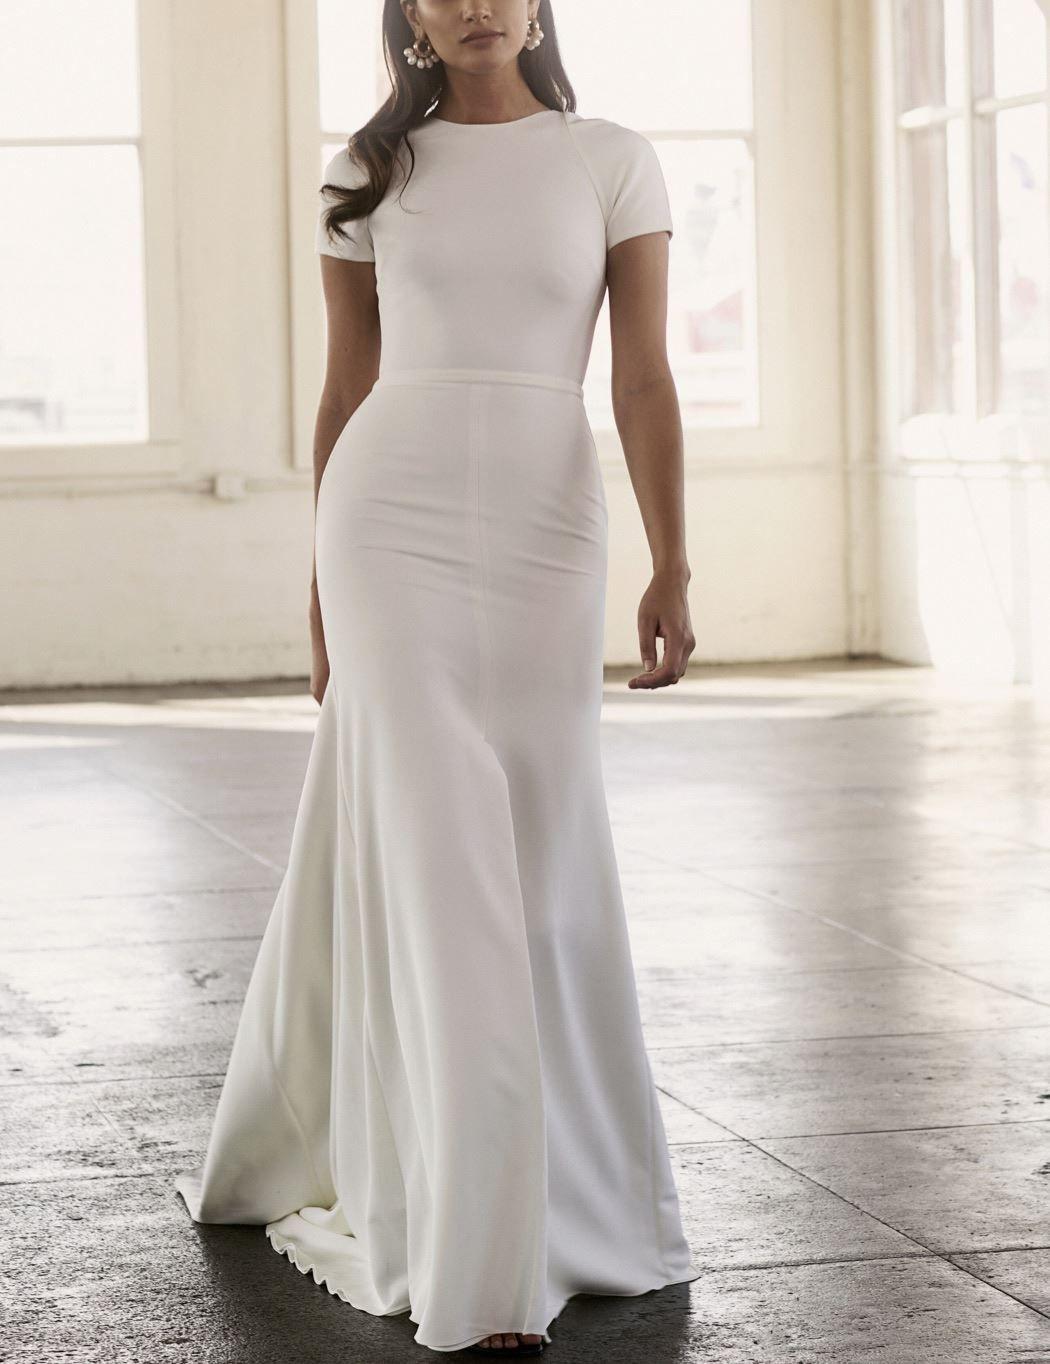 Sarah Seven Christi Short Sleeve Wedding Gown At Lovely Bride Short Sleeve Wedding Dress Modern Short Wedding Dress Short White Dress Wedding [ 1364 x 1050 Pixel ]